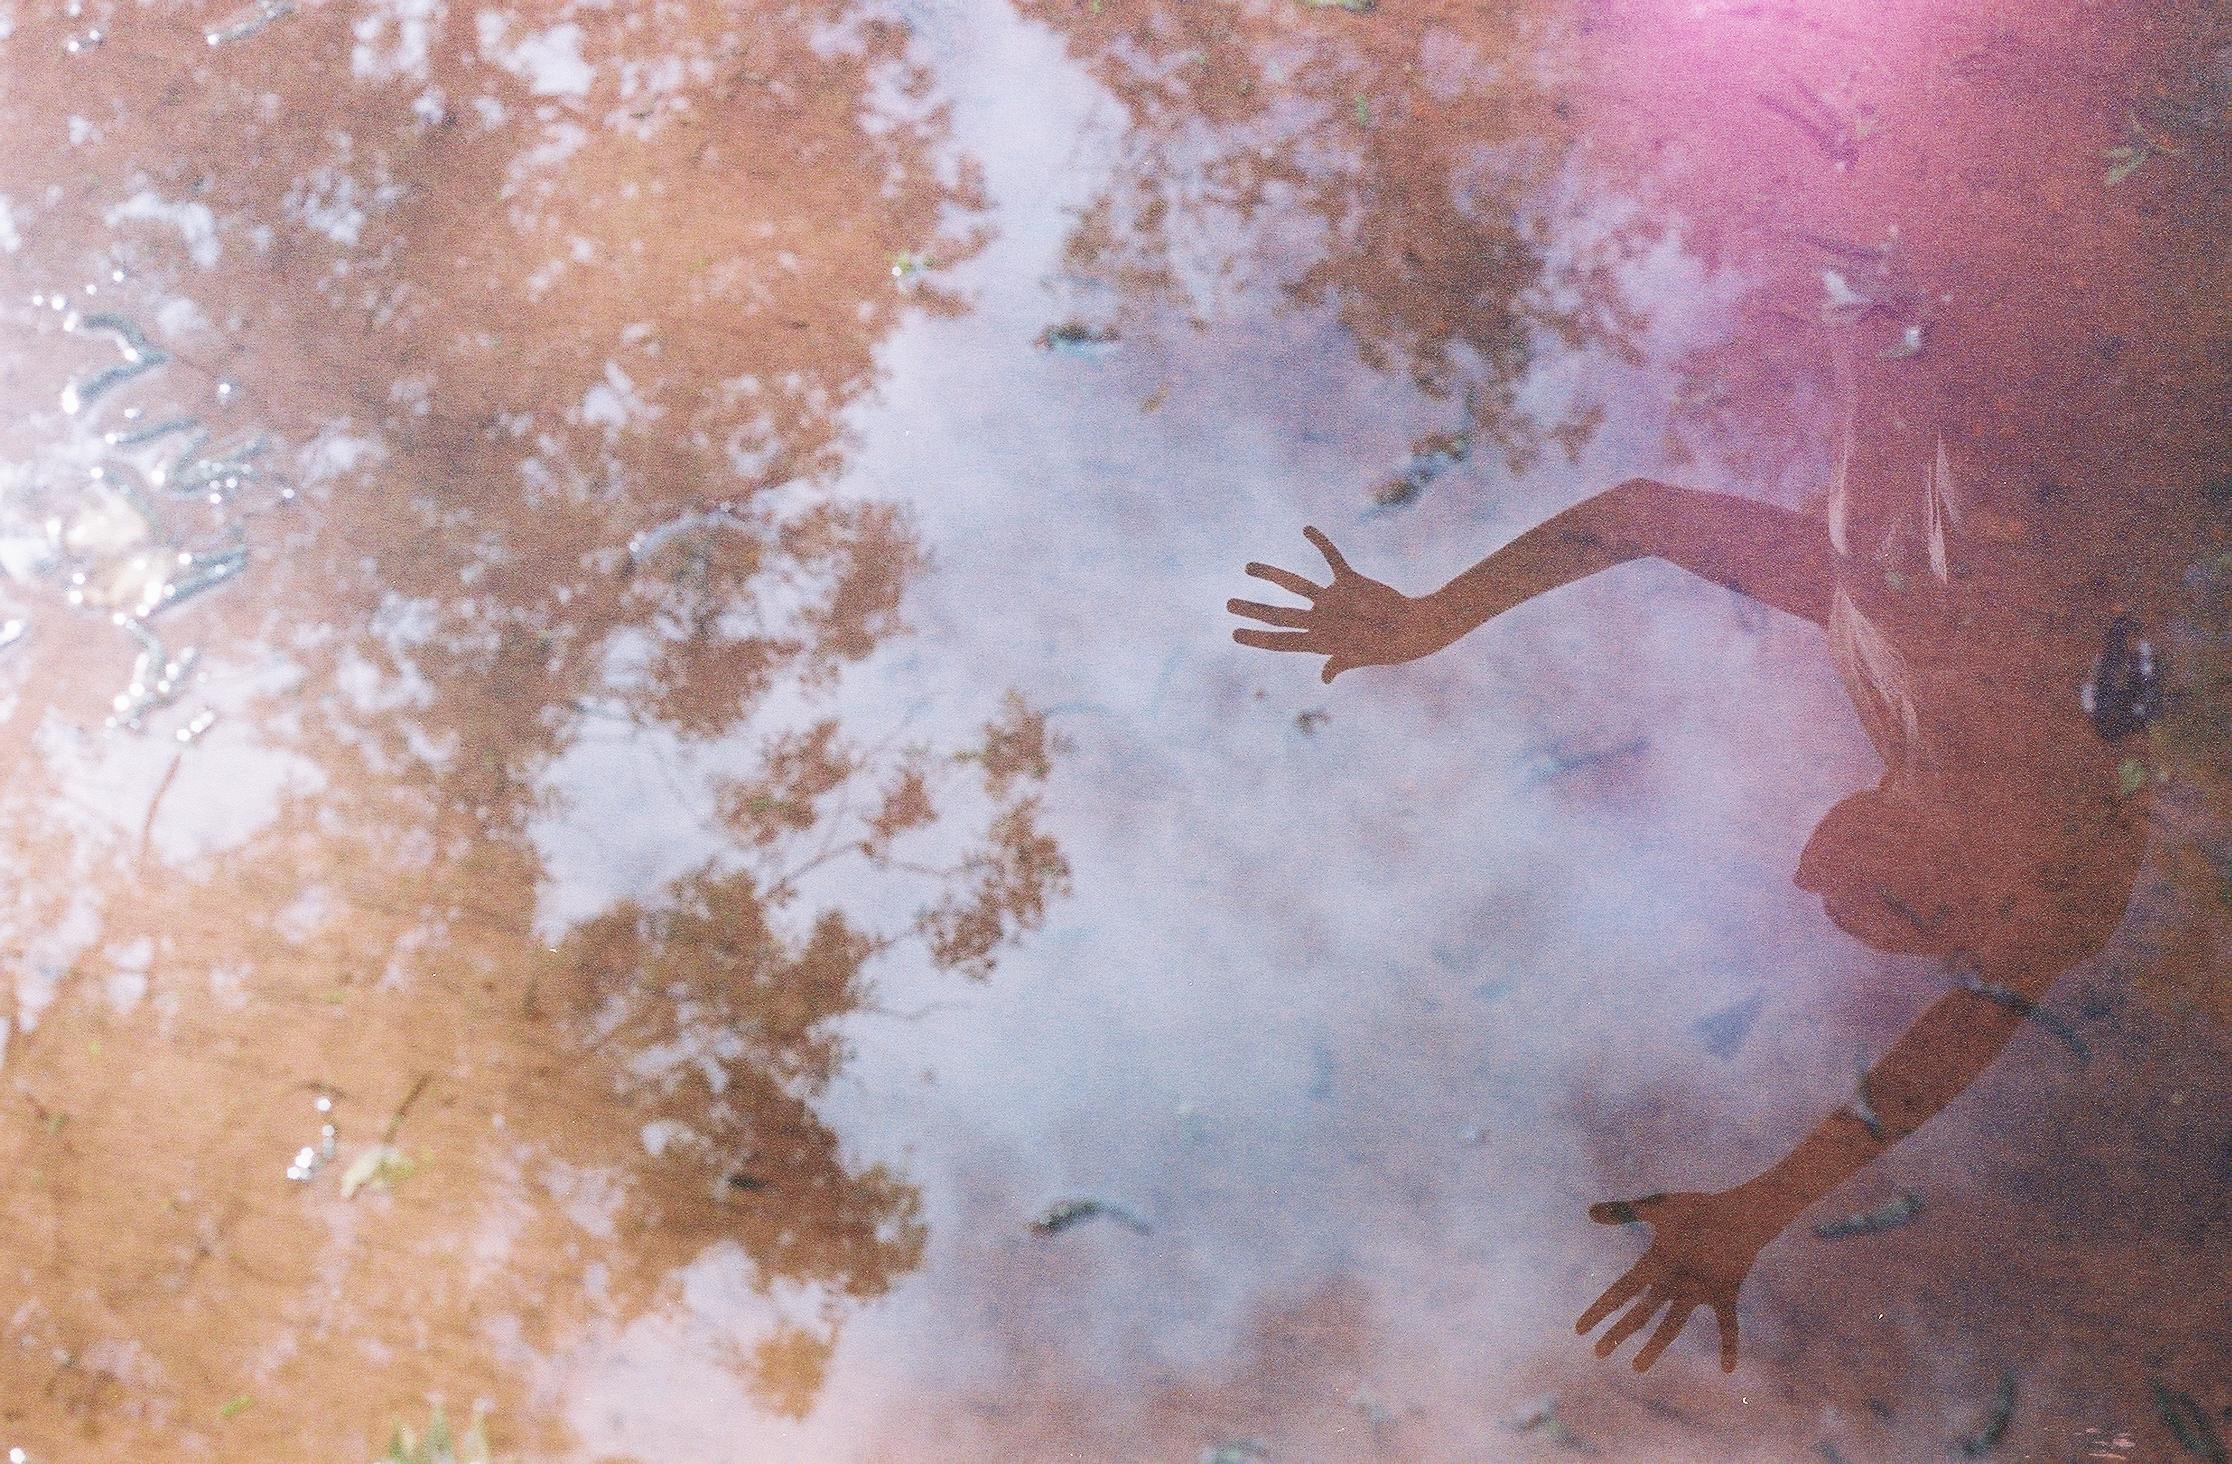 Dream_and_Awake_by_Logan_03.jpg